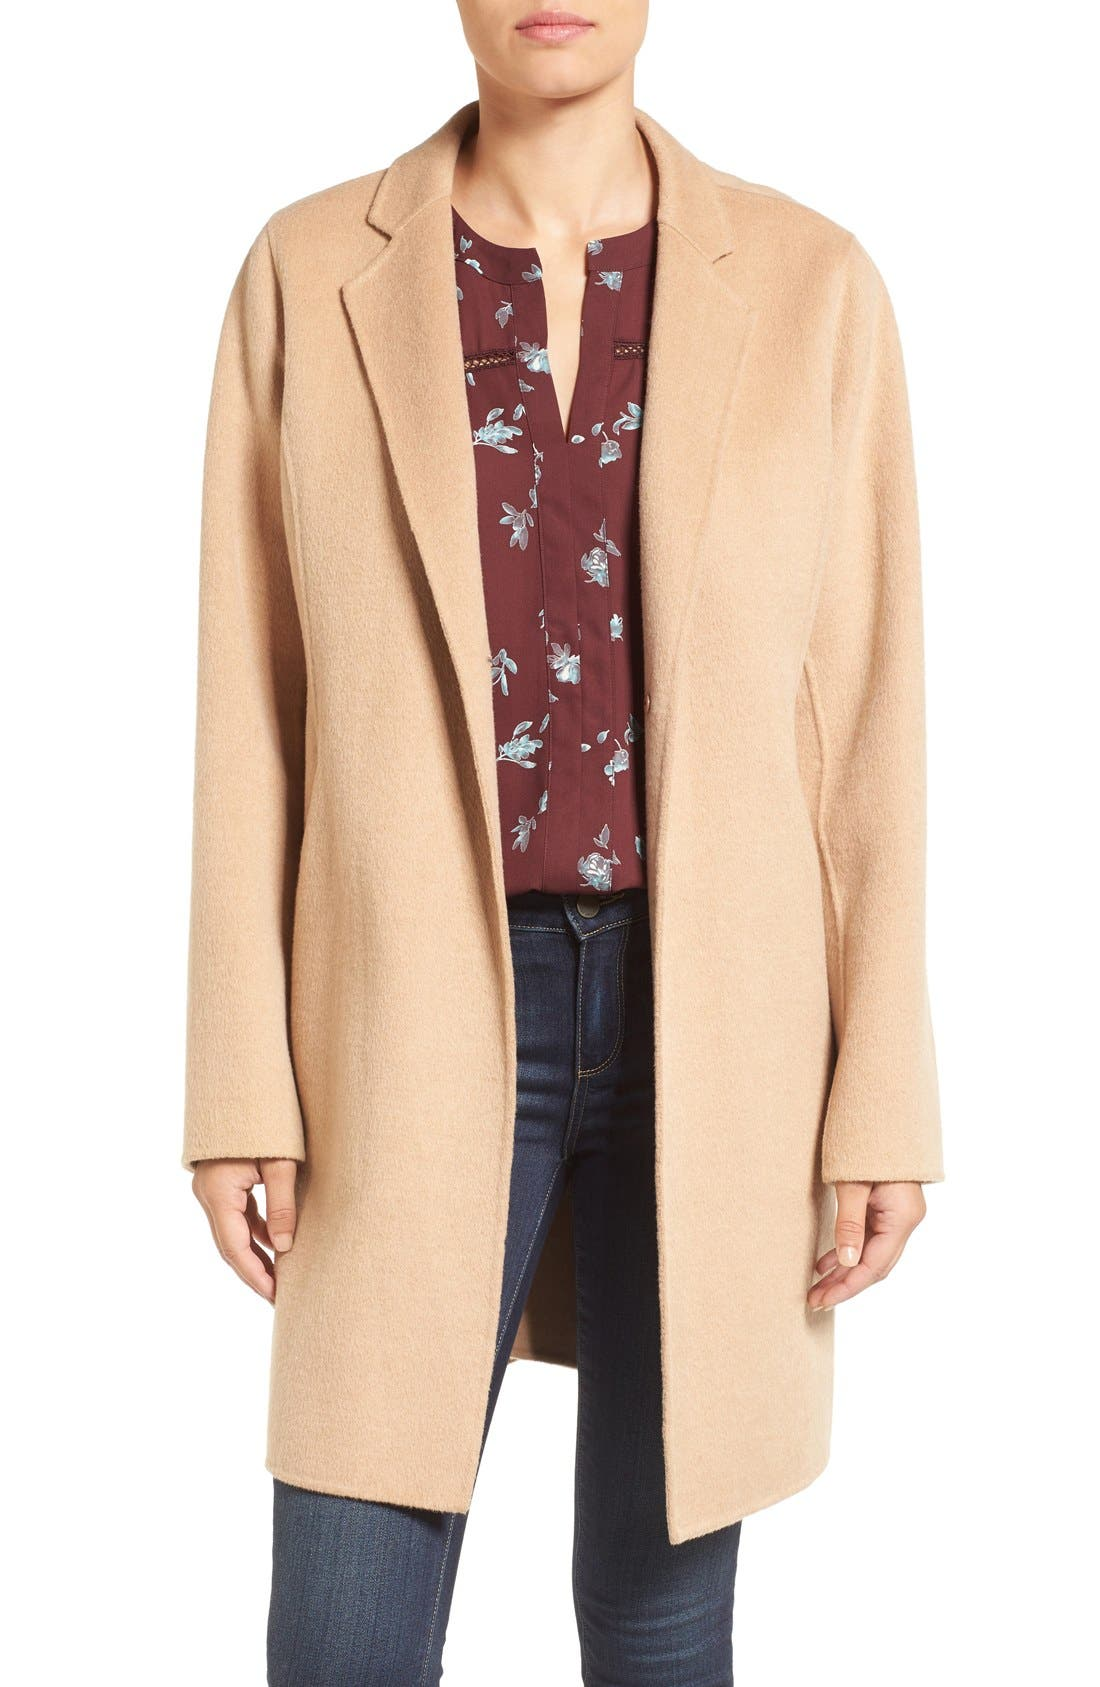 MICHAEL Michael Kors Double Face Wool Blend Coat (Regular & Petite)